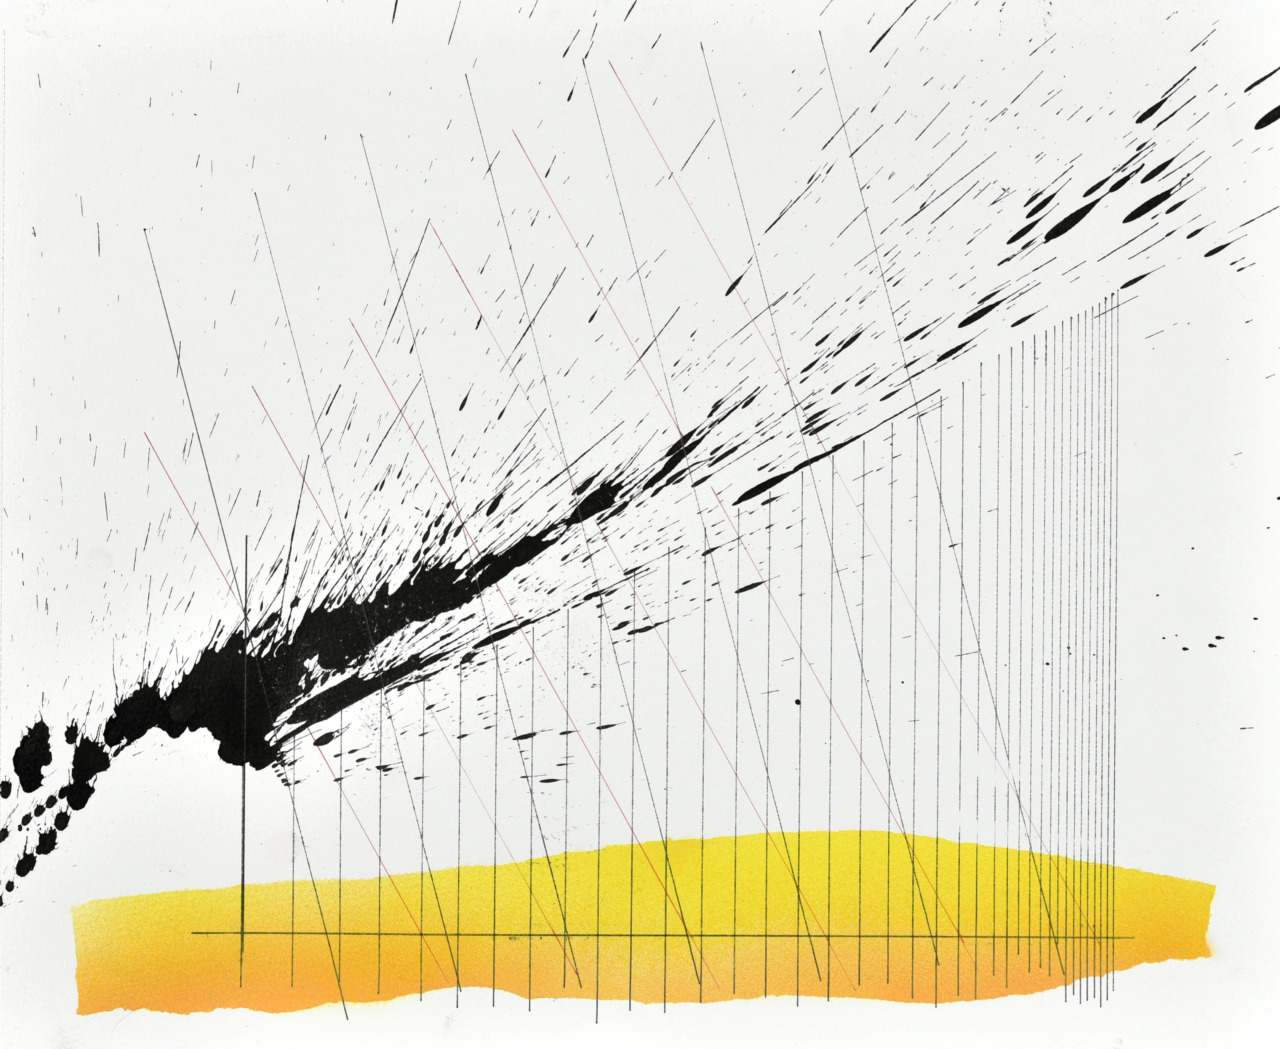 Op210520. Acrylic on paper, 37x46cm